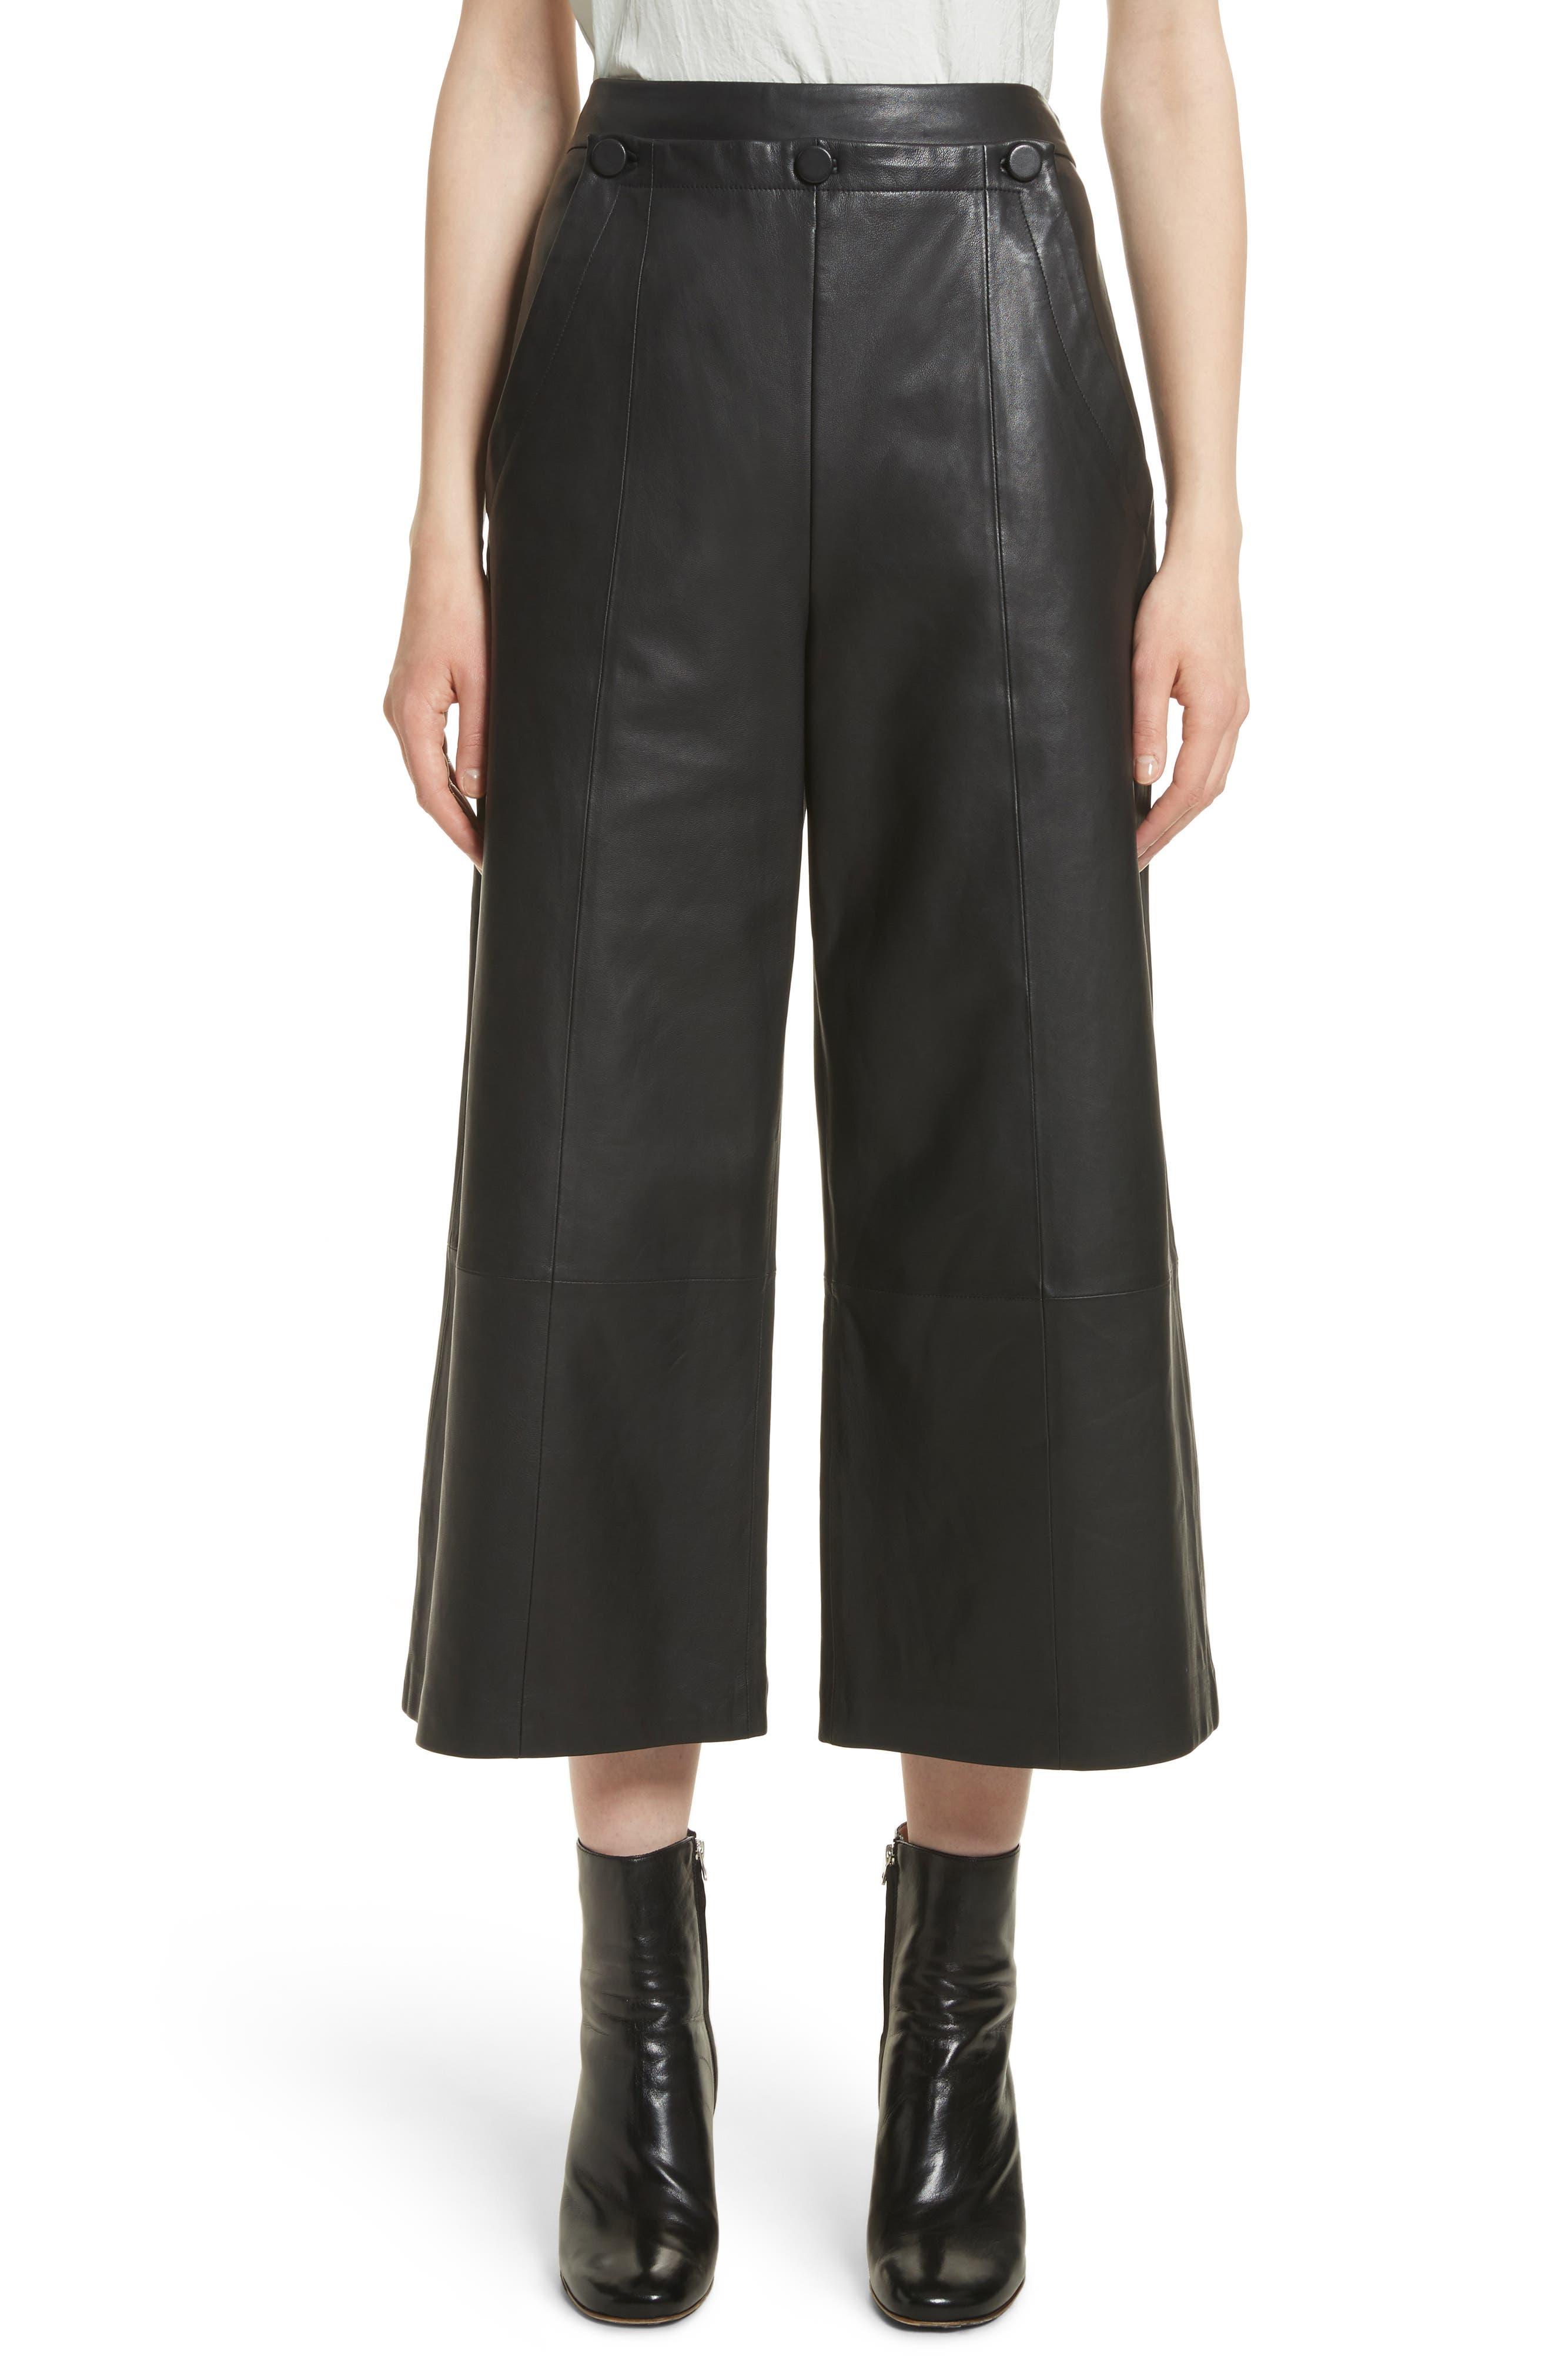 GREY Jason Wu Crop Wide Leg Leather Pants